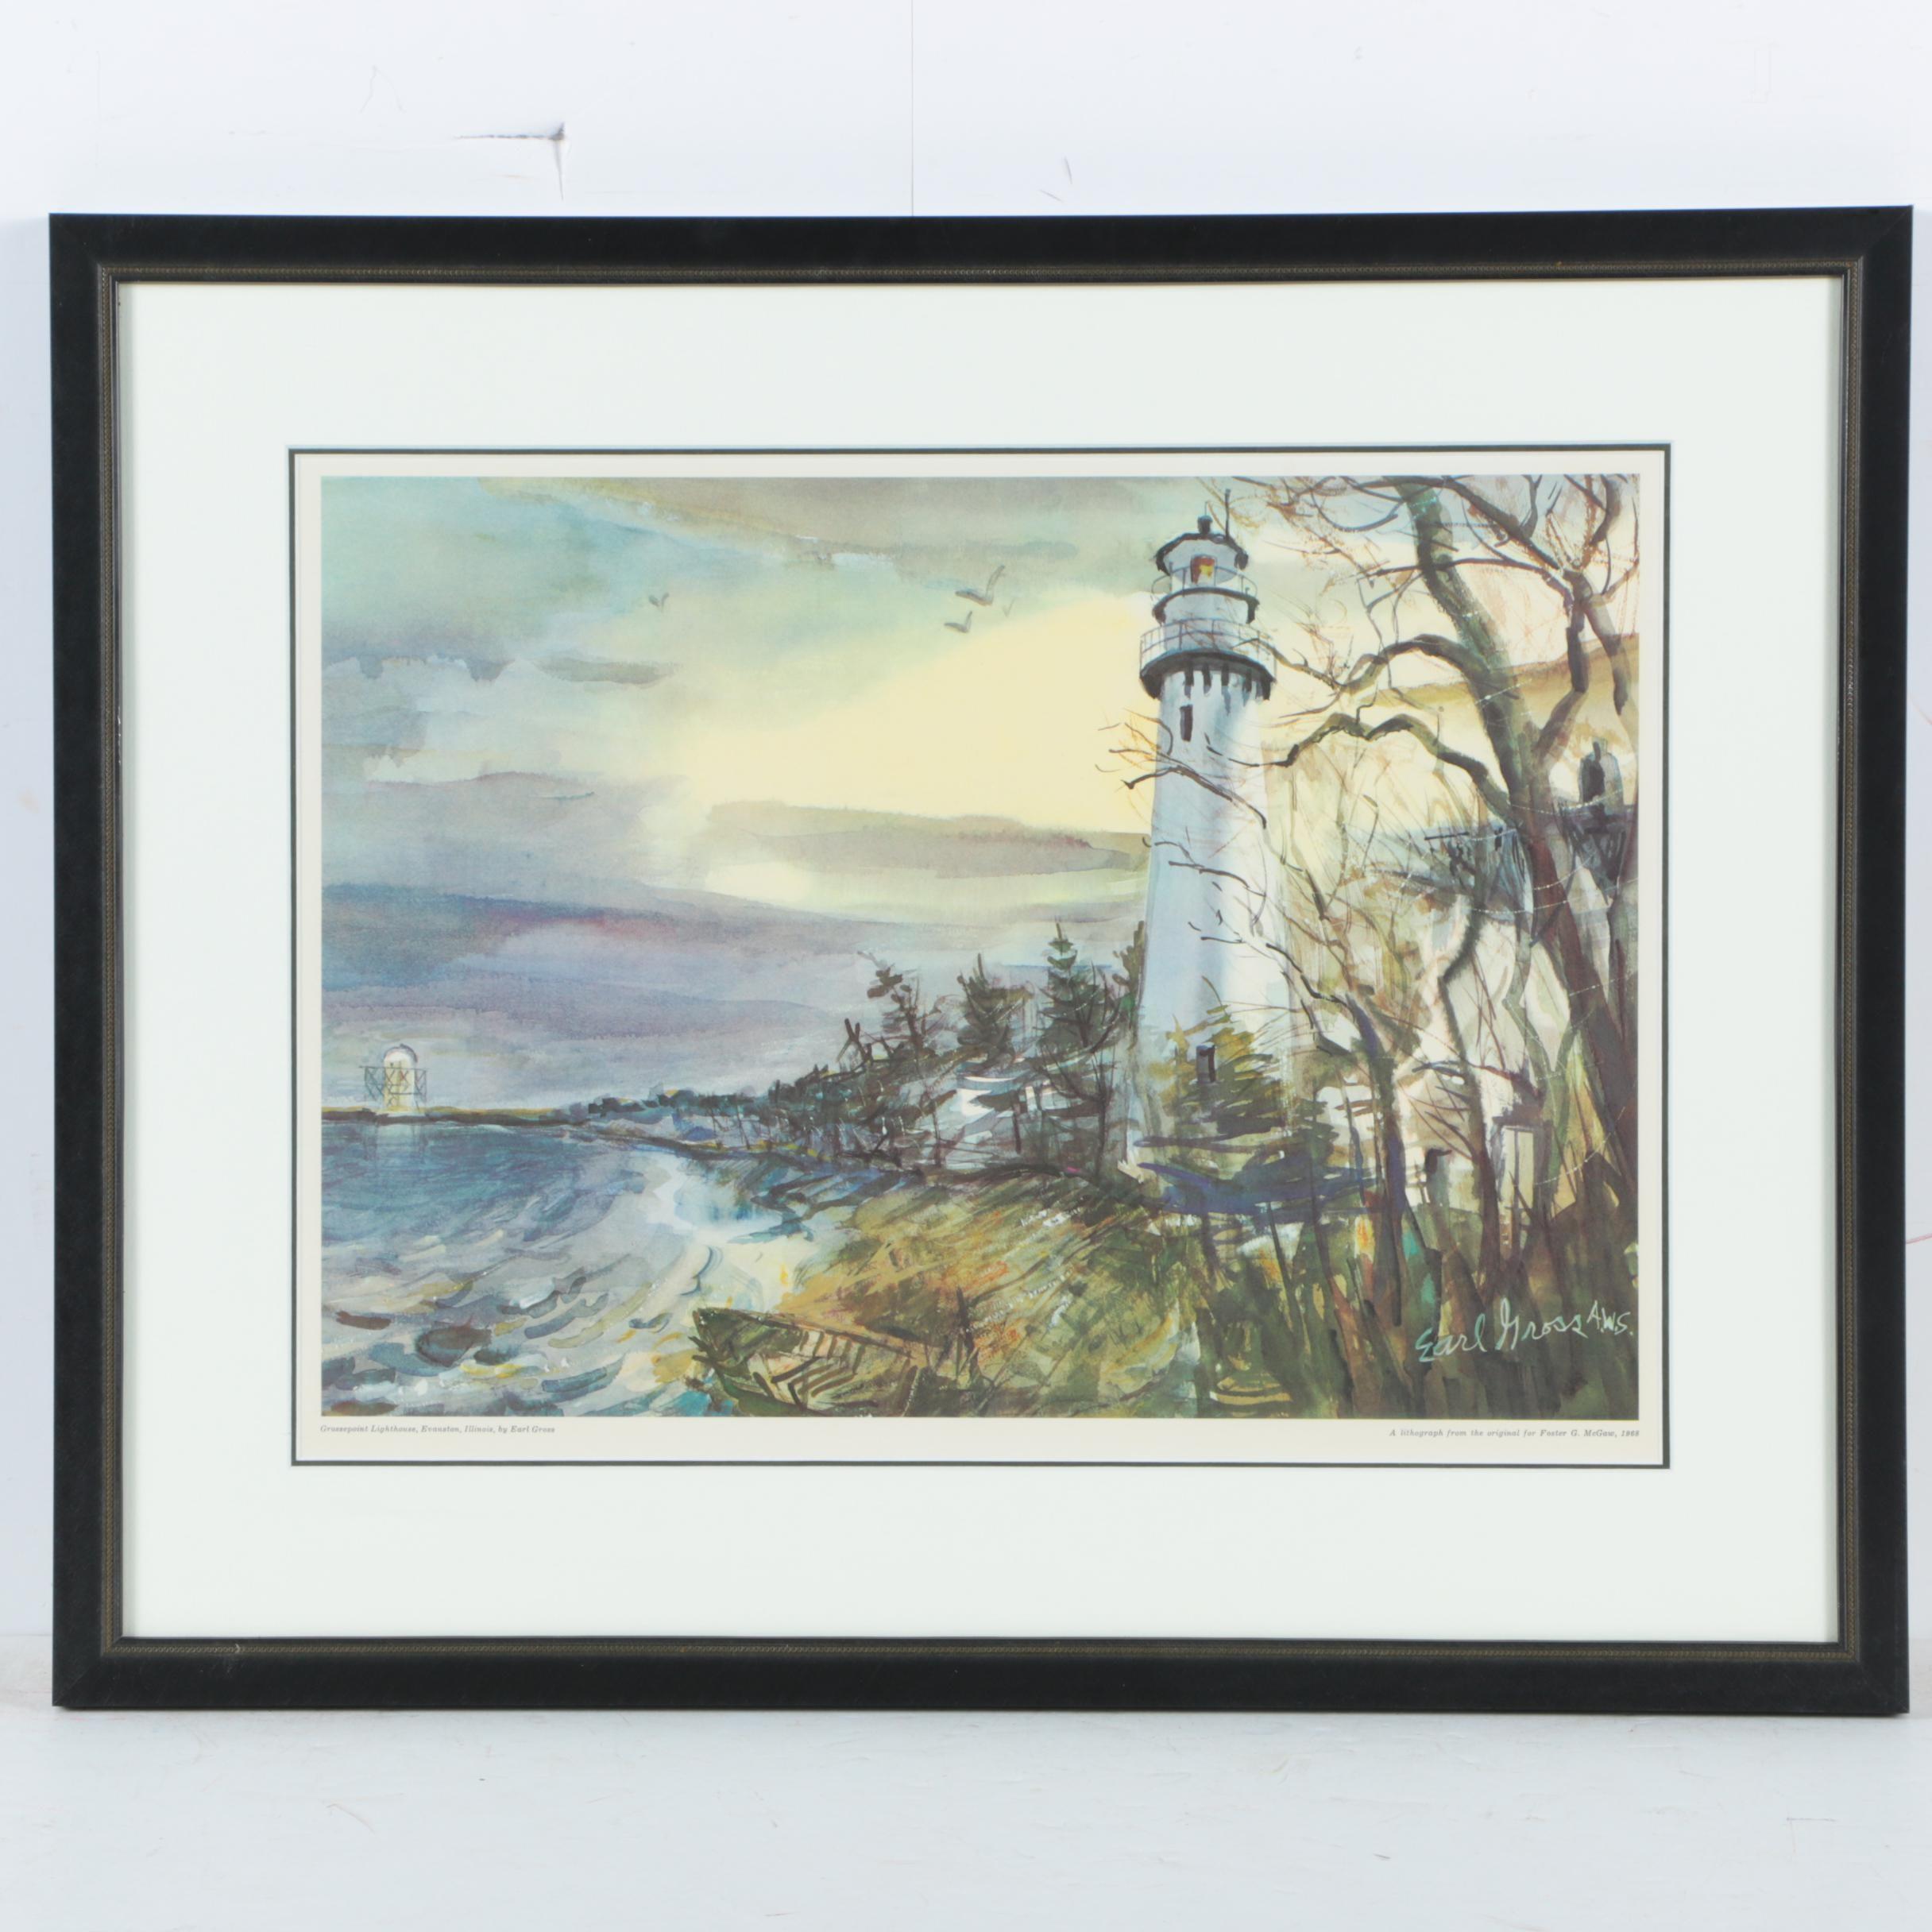 Offset Lithograph After Earl Gross of a Lighthouse